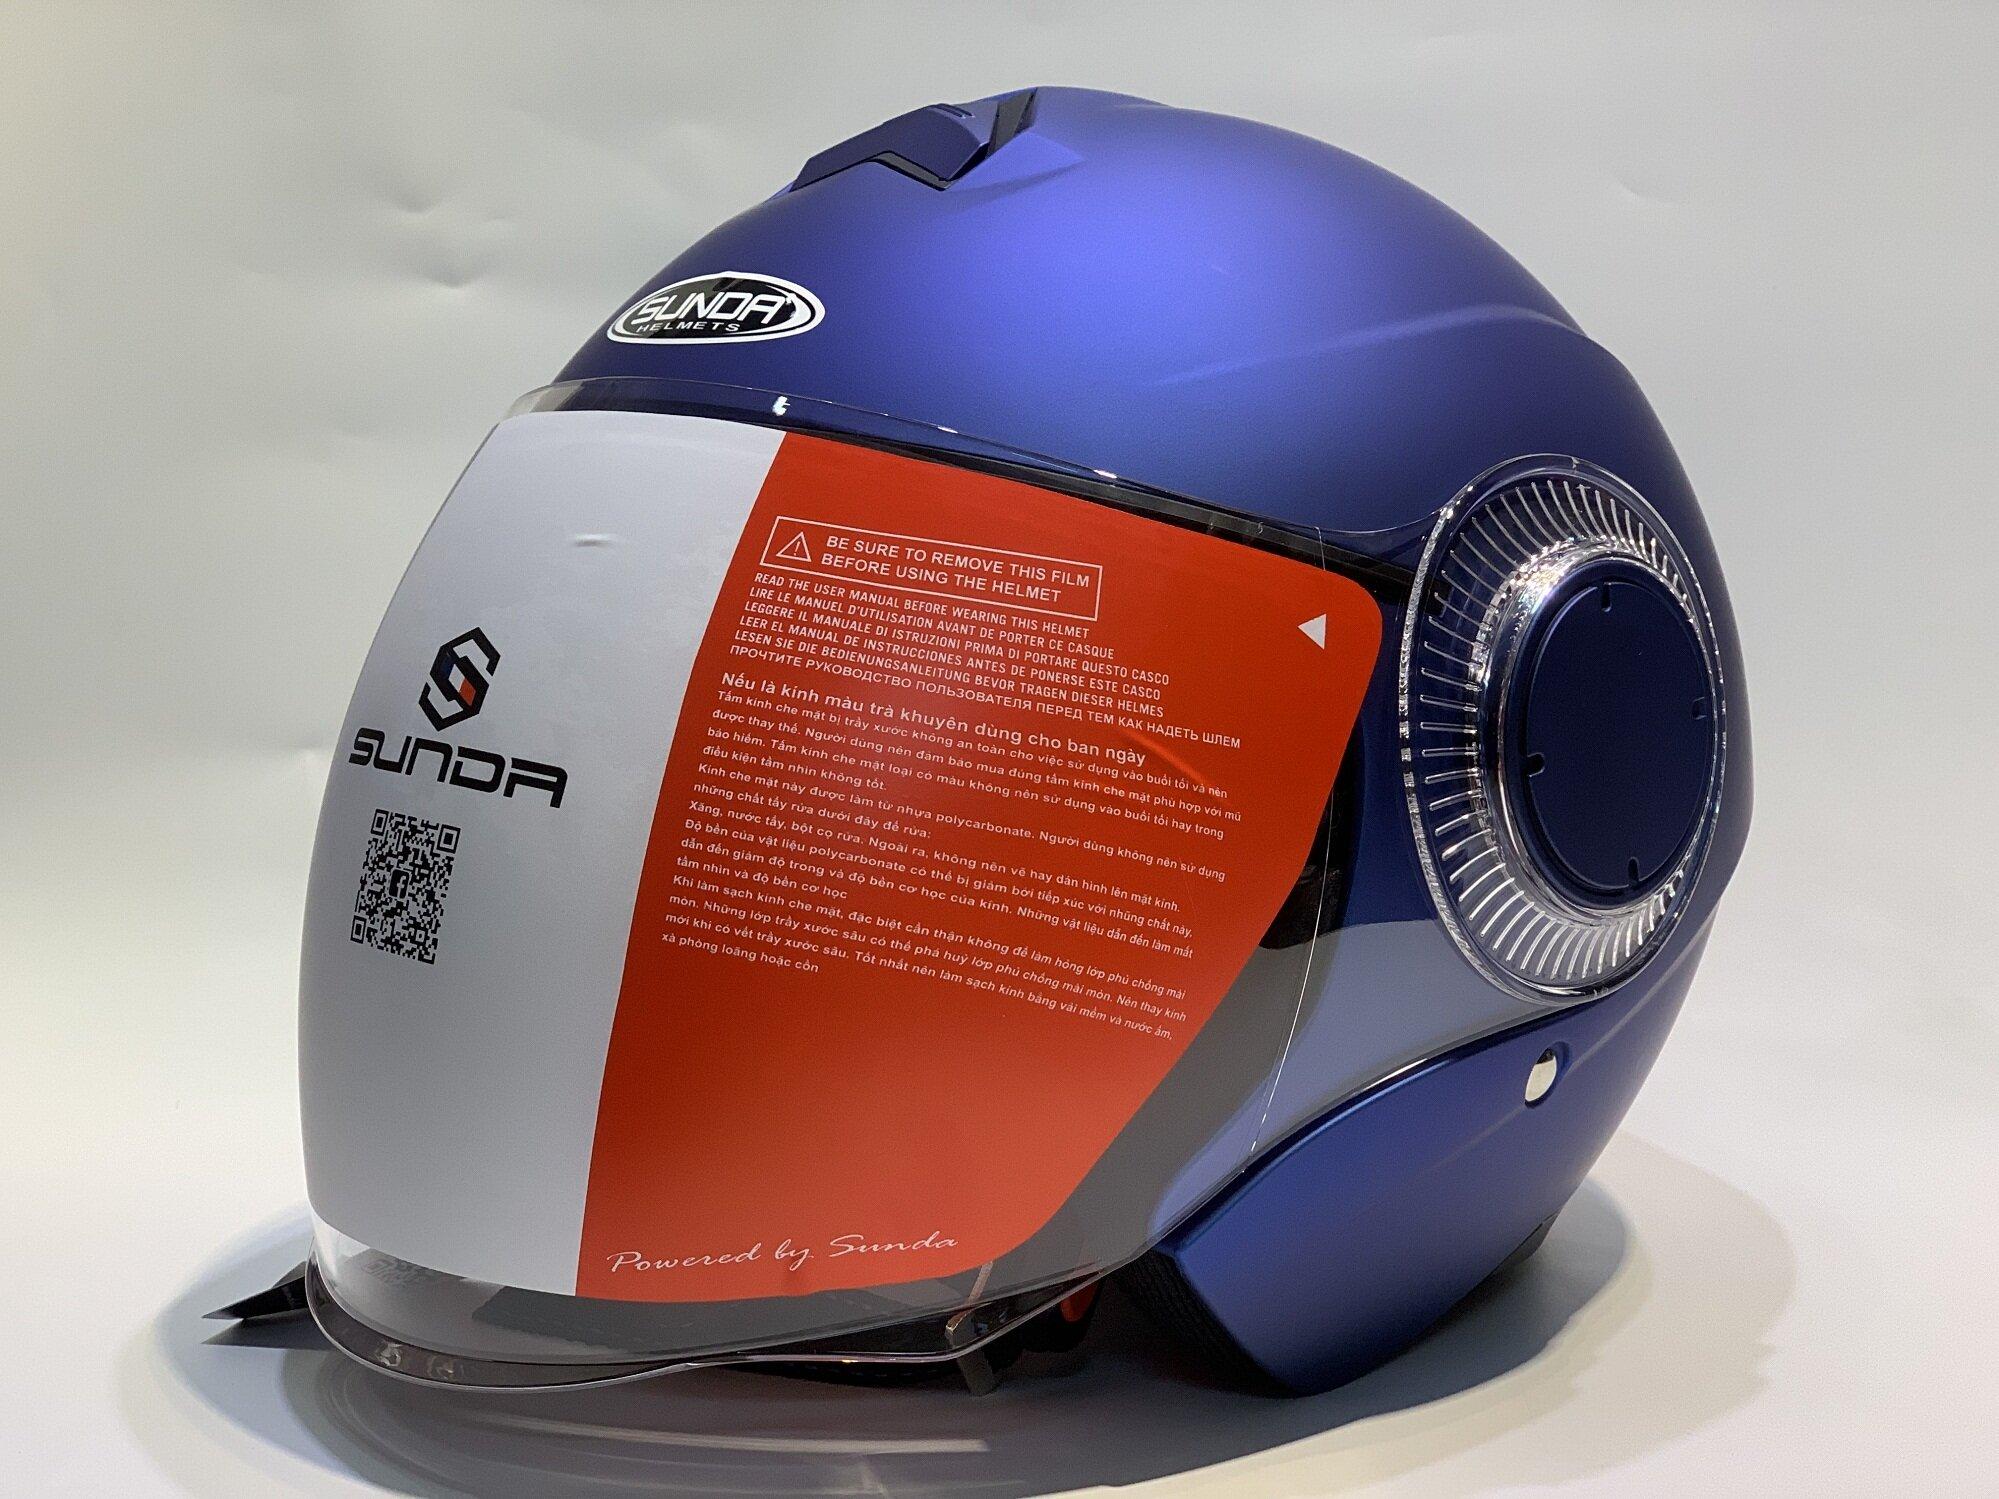 Mũ bảo hiểm kiểu trùm đầu fullface Sunda